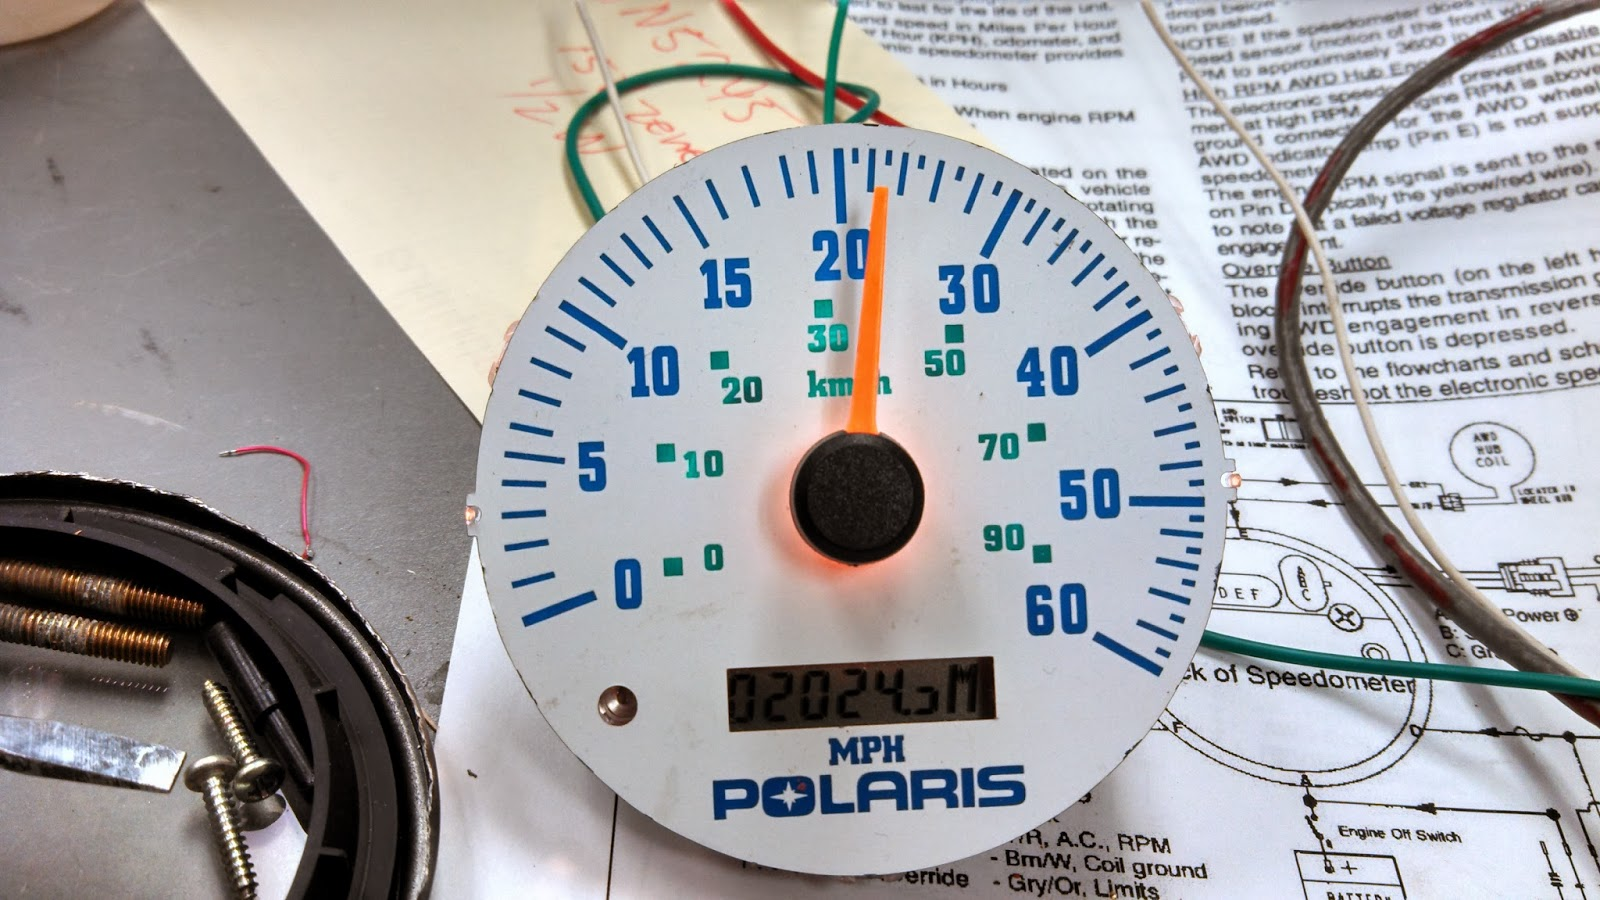 medium resolution of 2001 polaris sportsman 500 awd wiring diagram